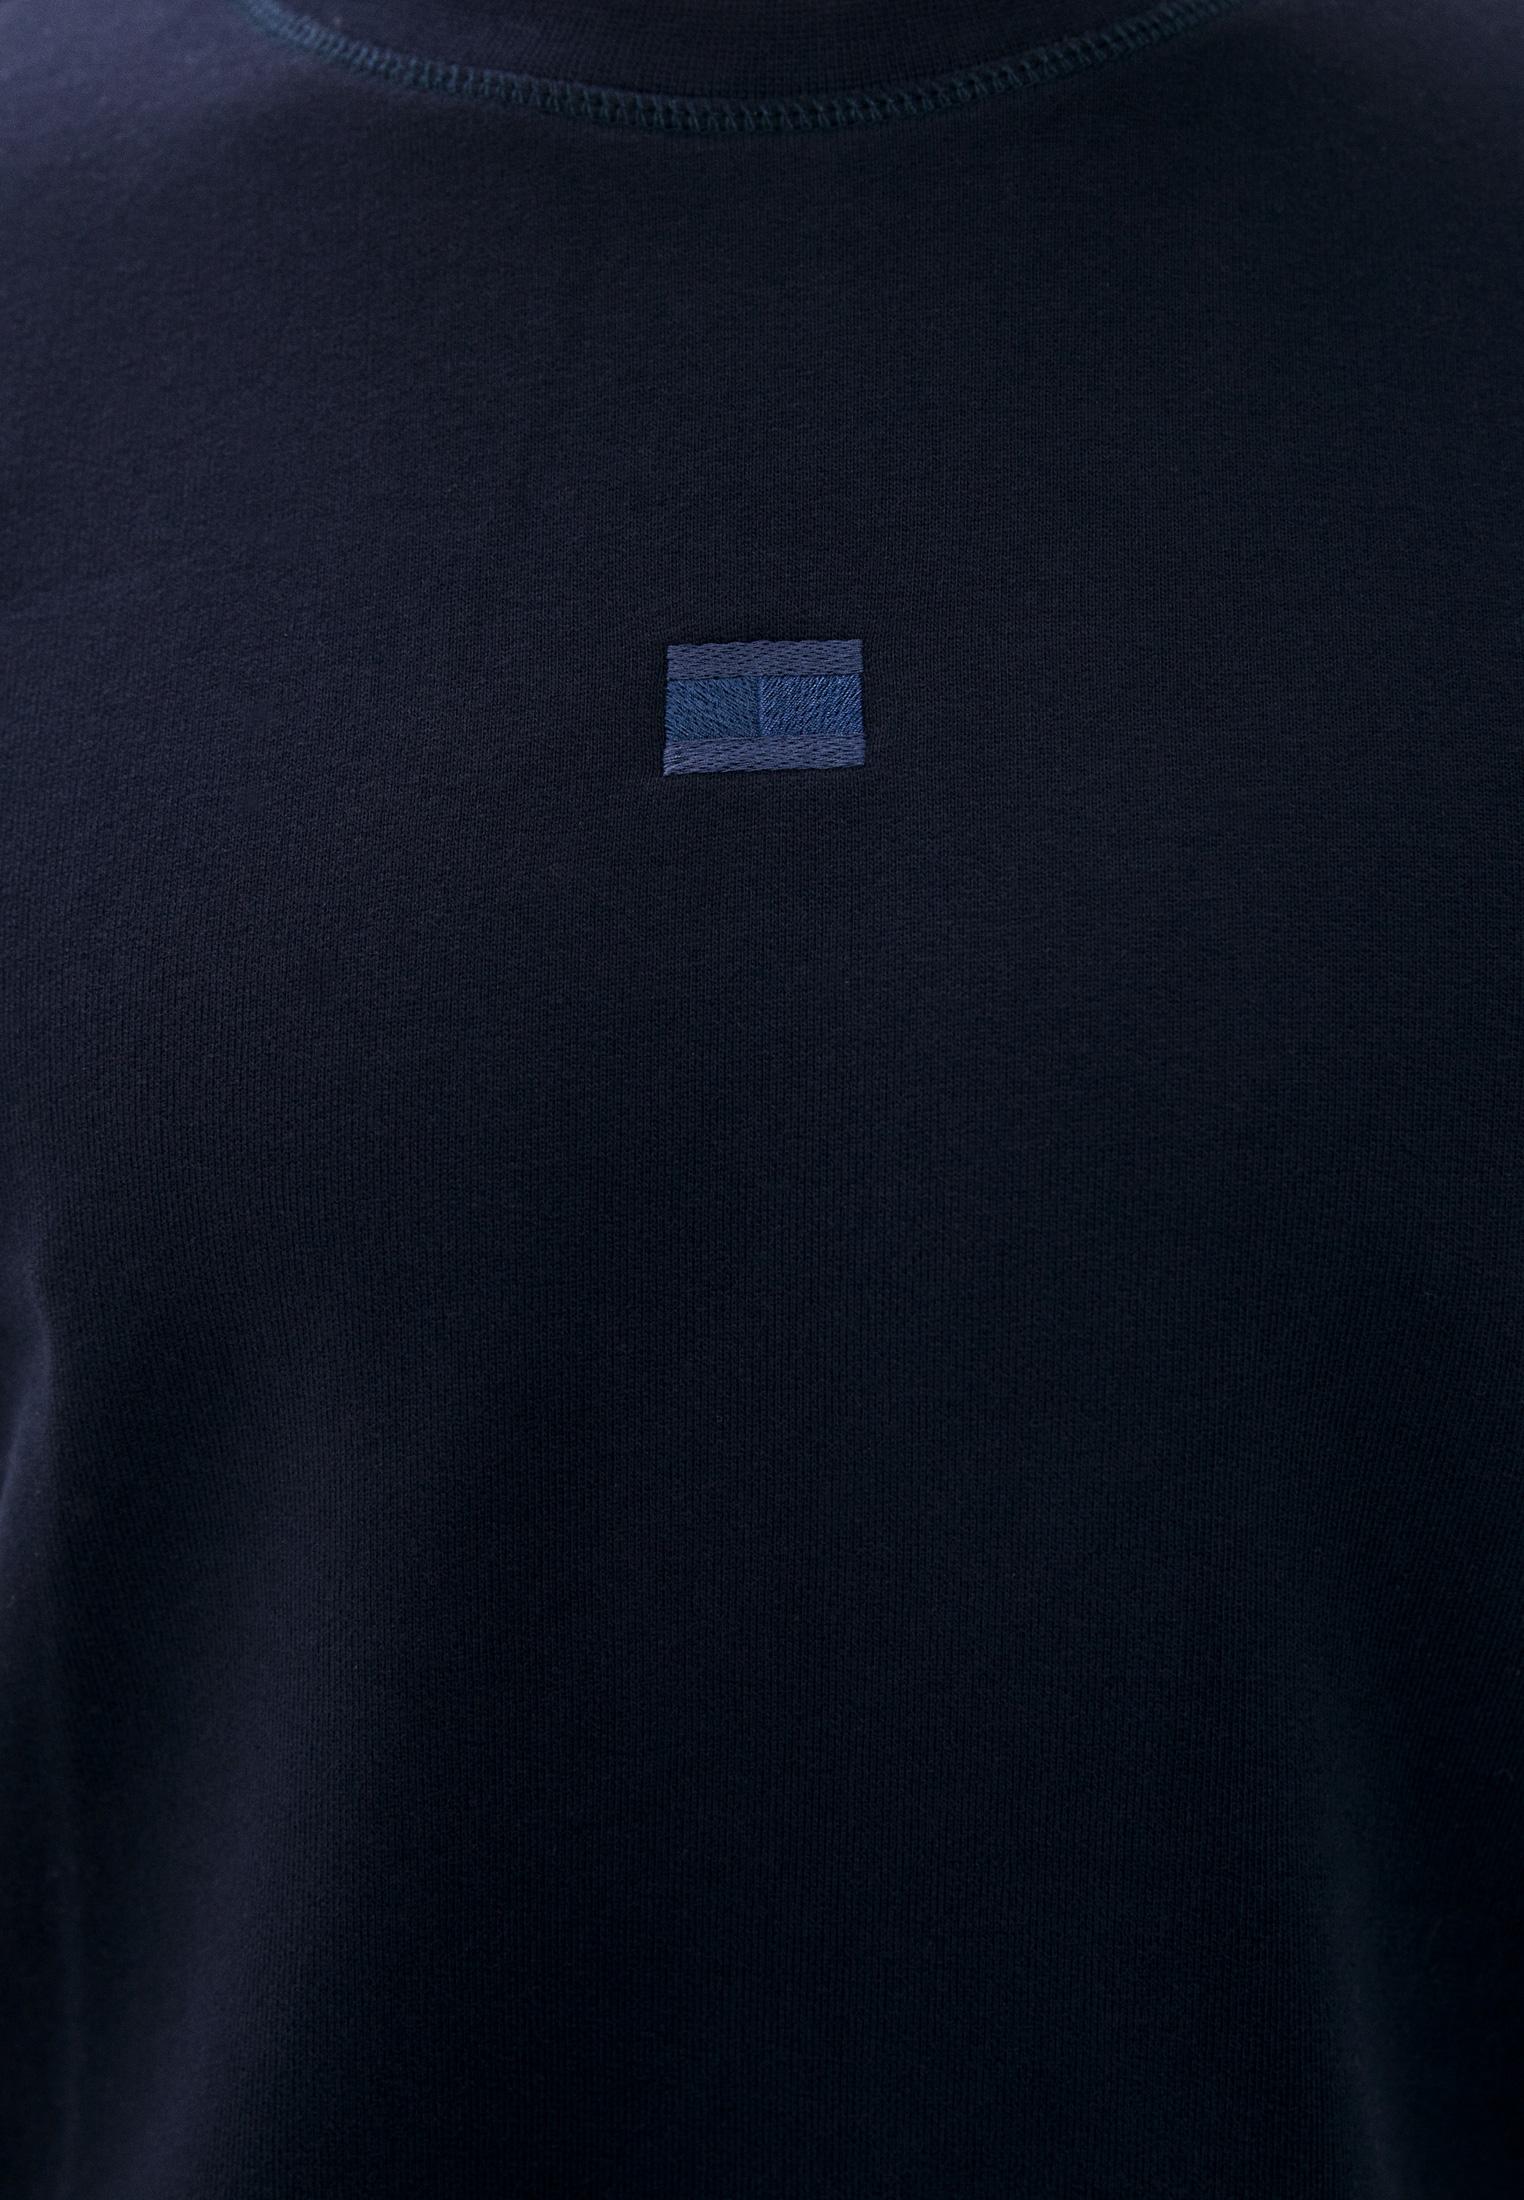 Мужские поло Tommy Hilfiger (Томми Хилфигер) MW0MW17779: изображение 4